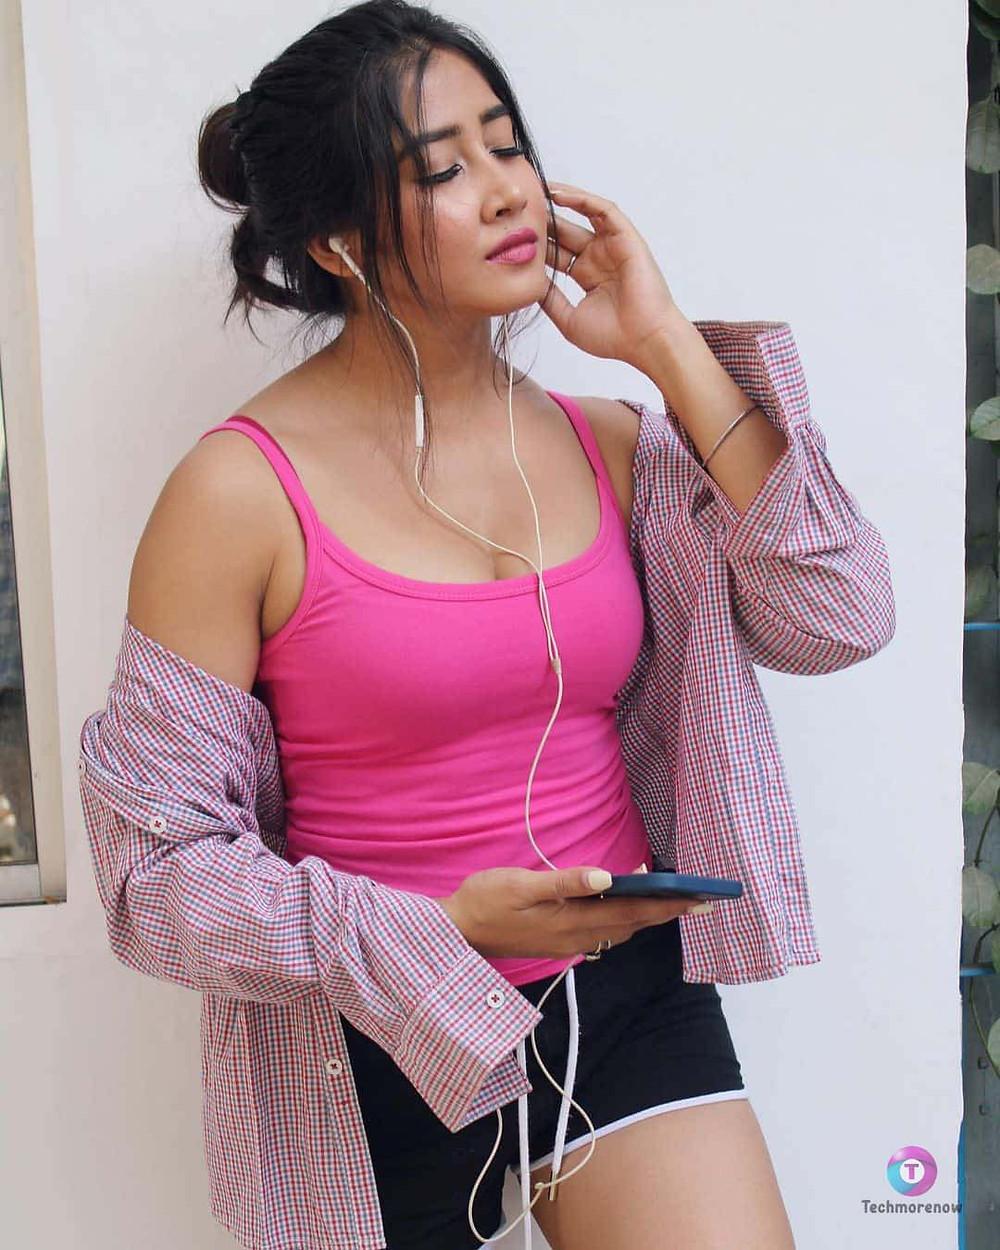 Sofia Ansari Hot Photos and Images